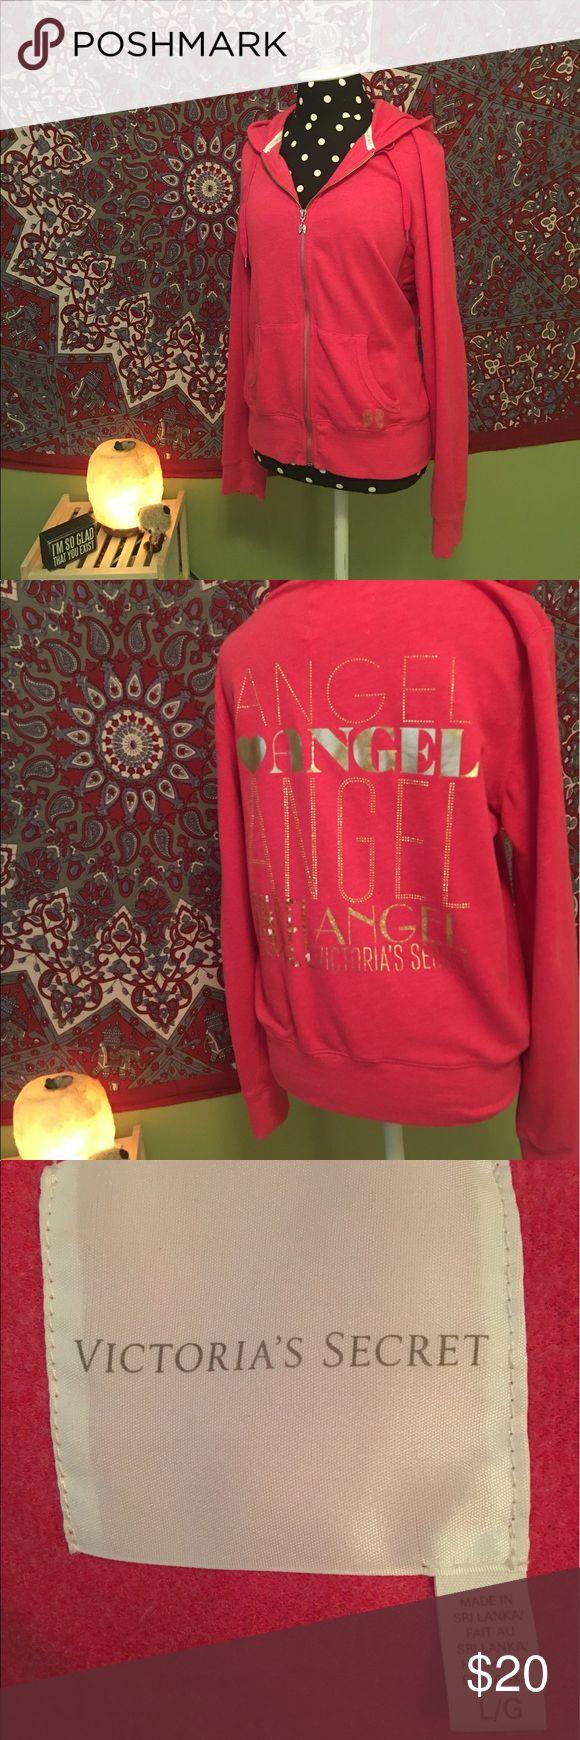 VS Pink Angel Zip Up Hoodie Size Large VS Pink Angel Zip Up Hoodie with Gold Sequin & Lettering Size Large Victoria's Secret Tops Sweatshirts & Hoodies